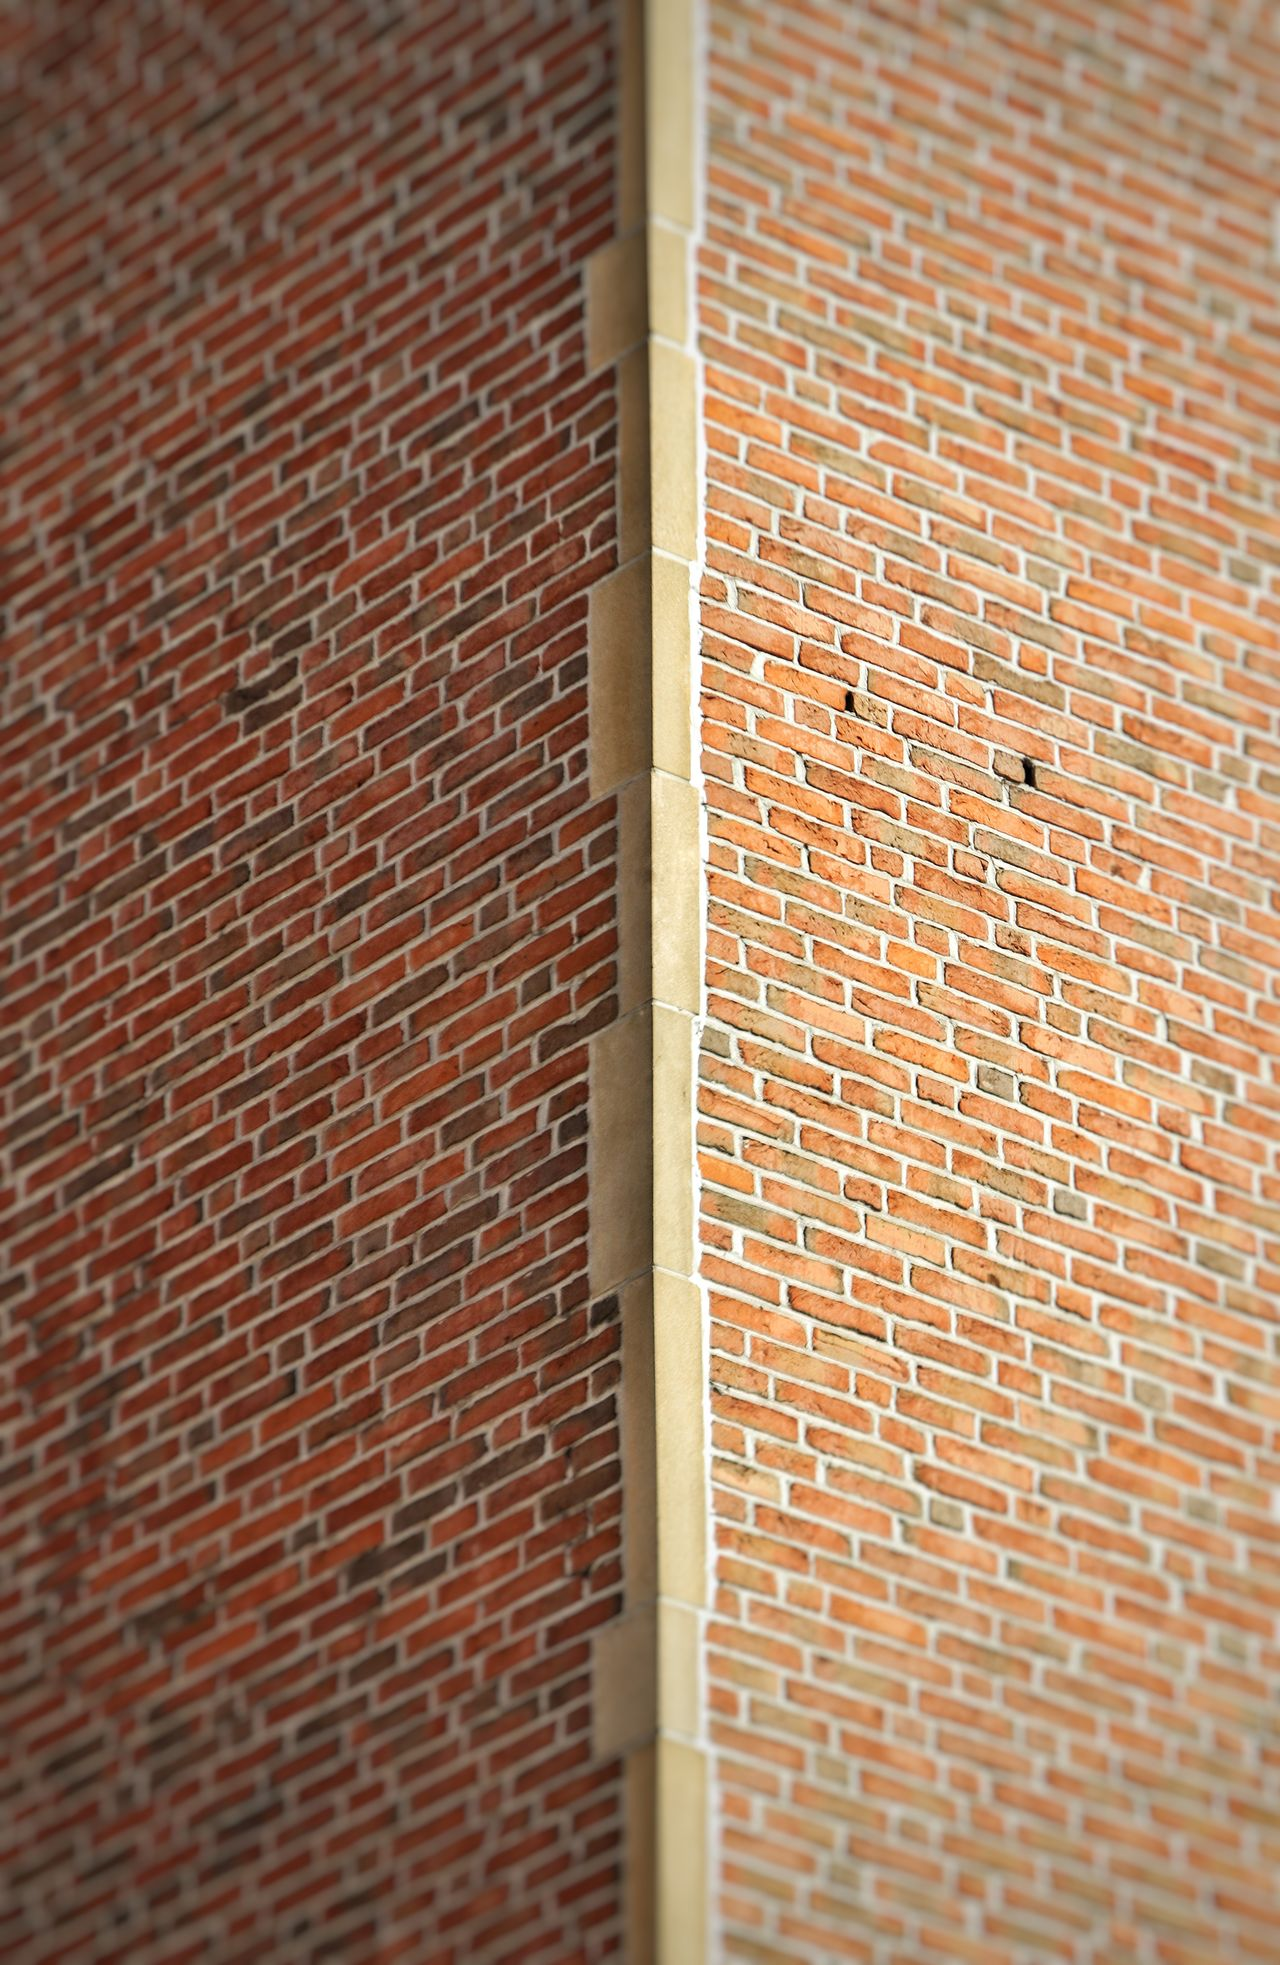 Brick Wall Bricks Brick Building Wall Repetition Symmetry Symmetrical Pattern Pattern, Texture, Shape And Form Patterns & Textures Pattern Texture Shape Design